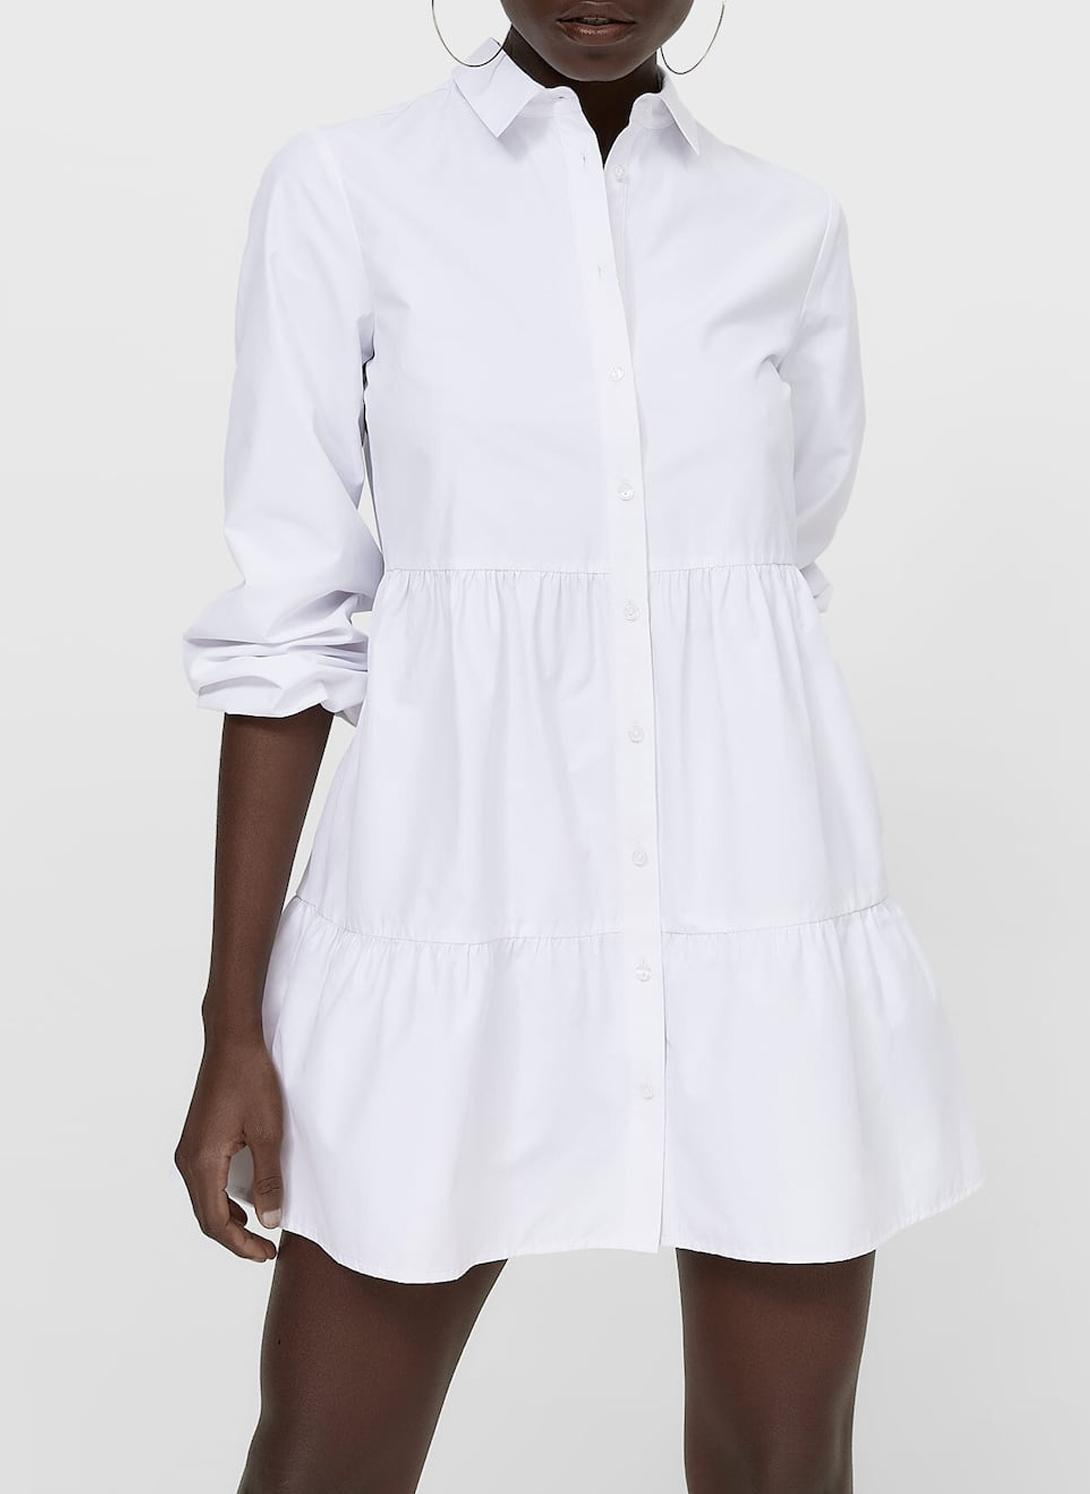 white shirt poplin dress